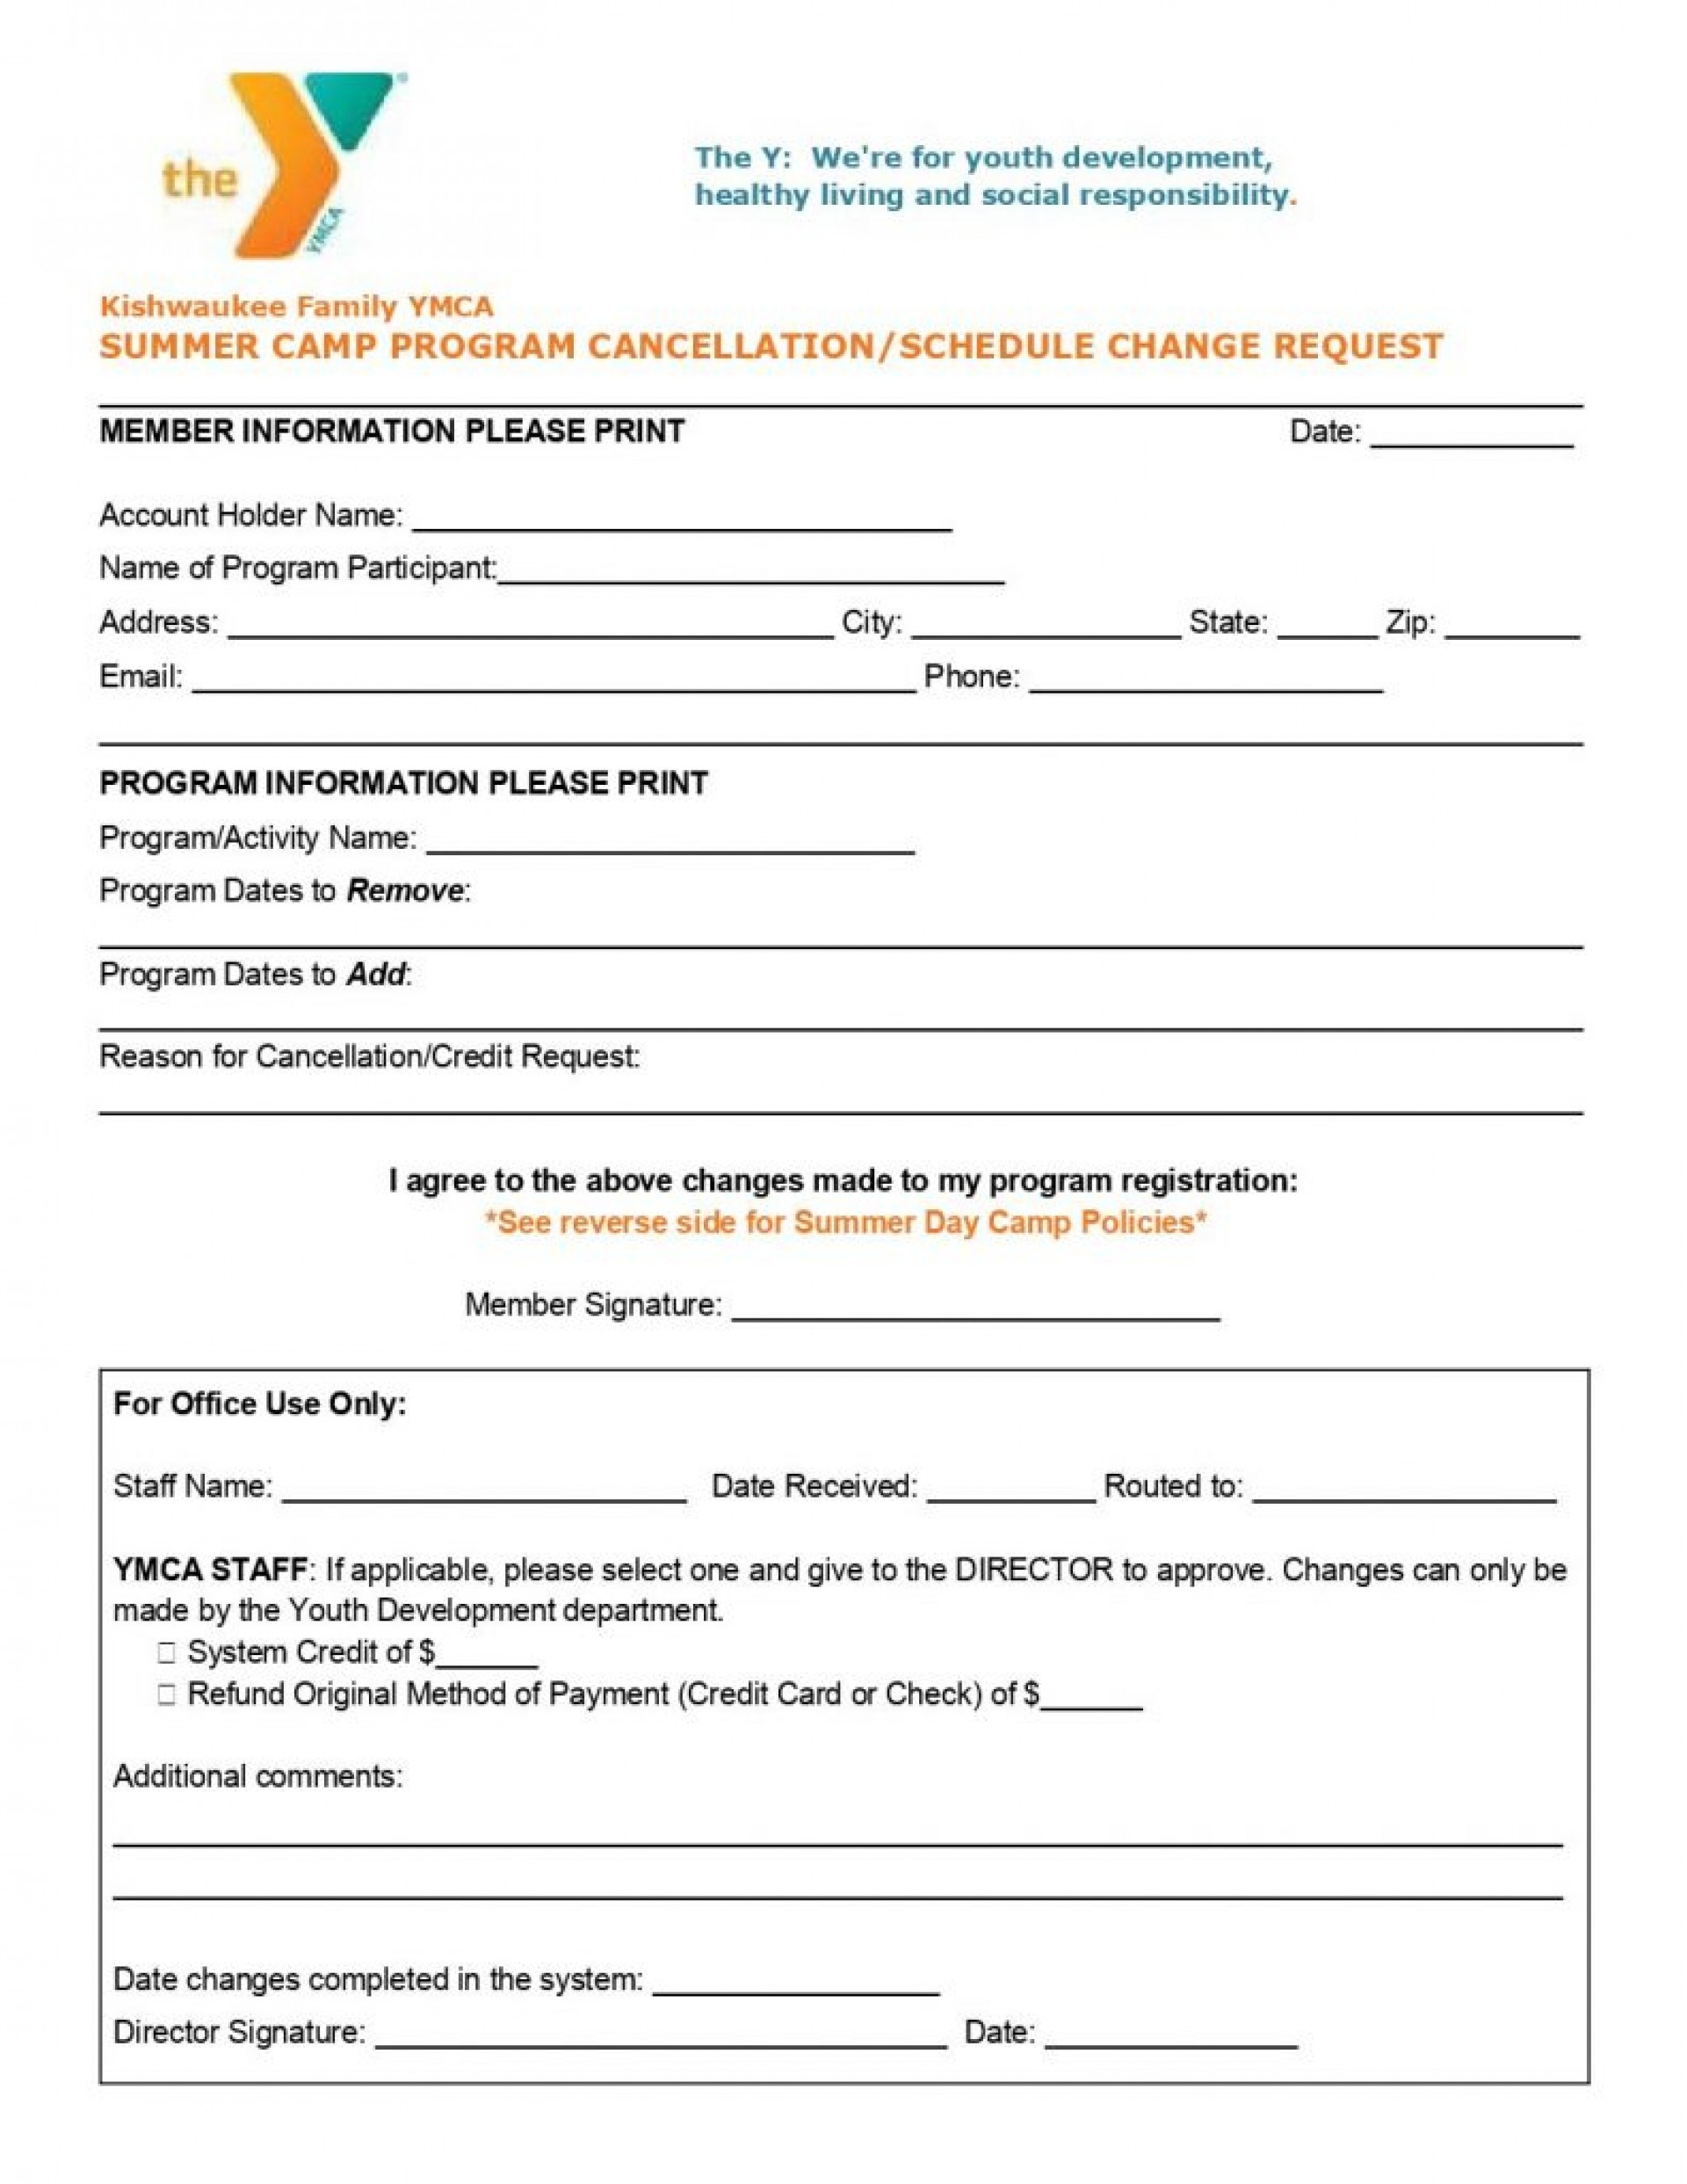 024 Summer Camp Program Cancellation Schedule Change Request pertaining to Summer Camp Schedule Template